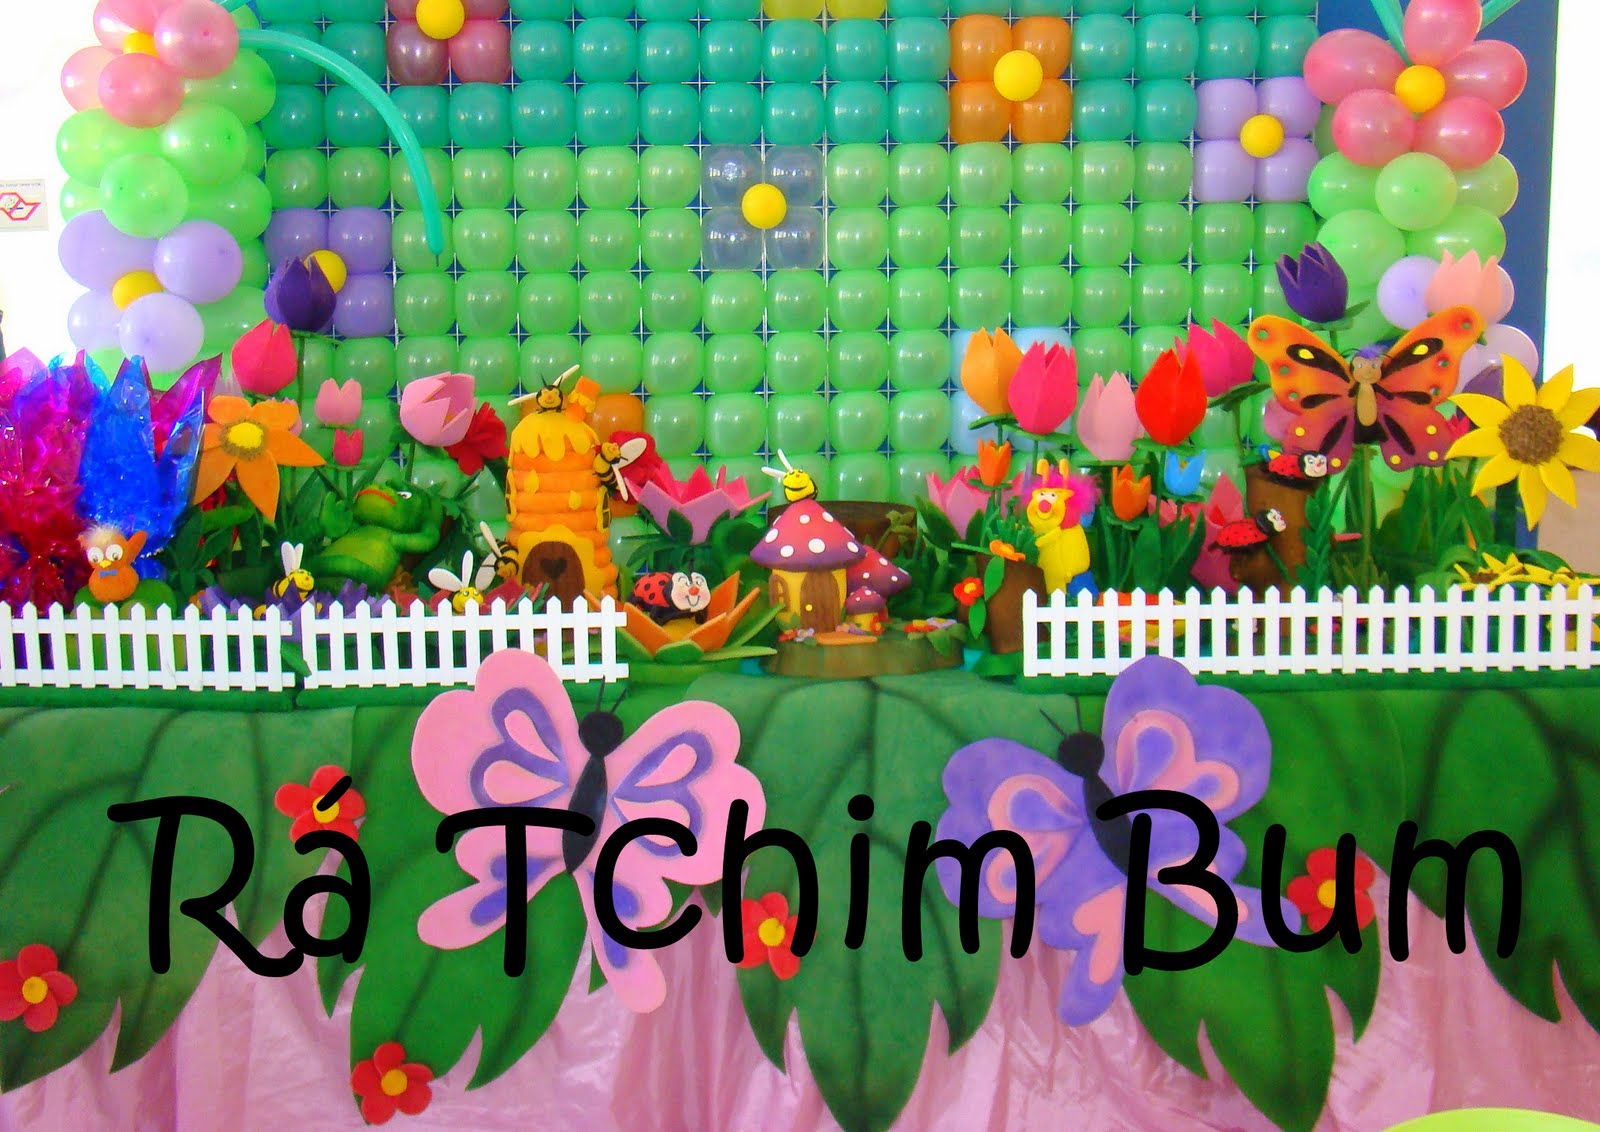 decoracao festa infantil jardim encantado joaninha:Decoracao De Festa No Jardim Infantil